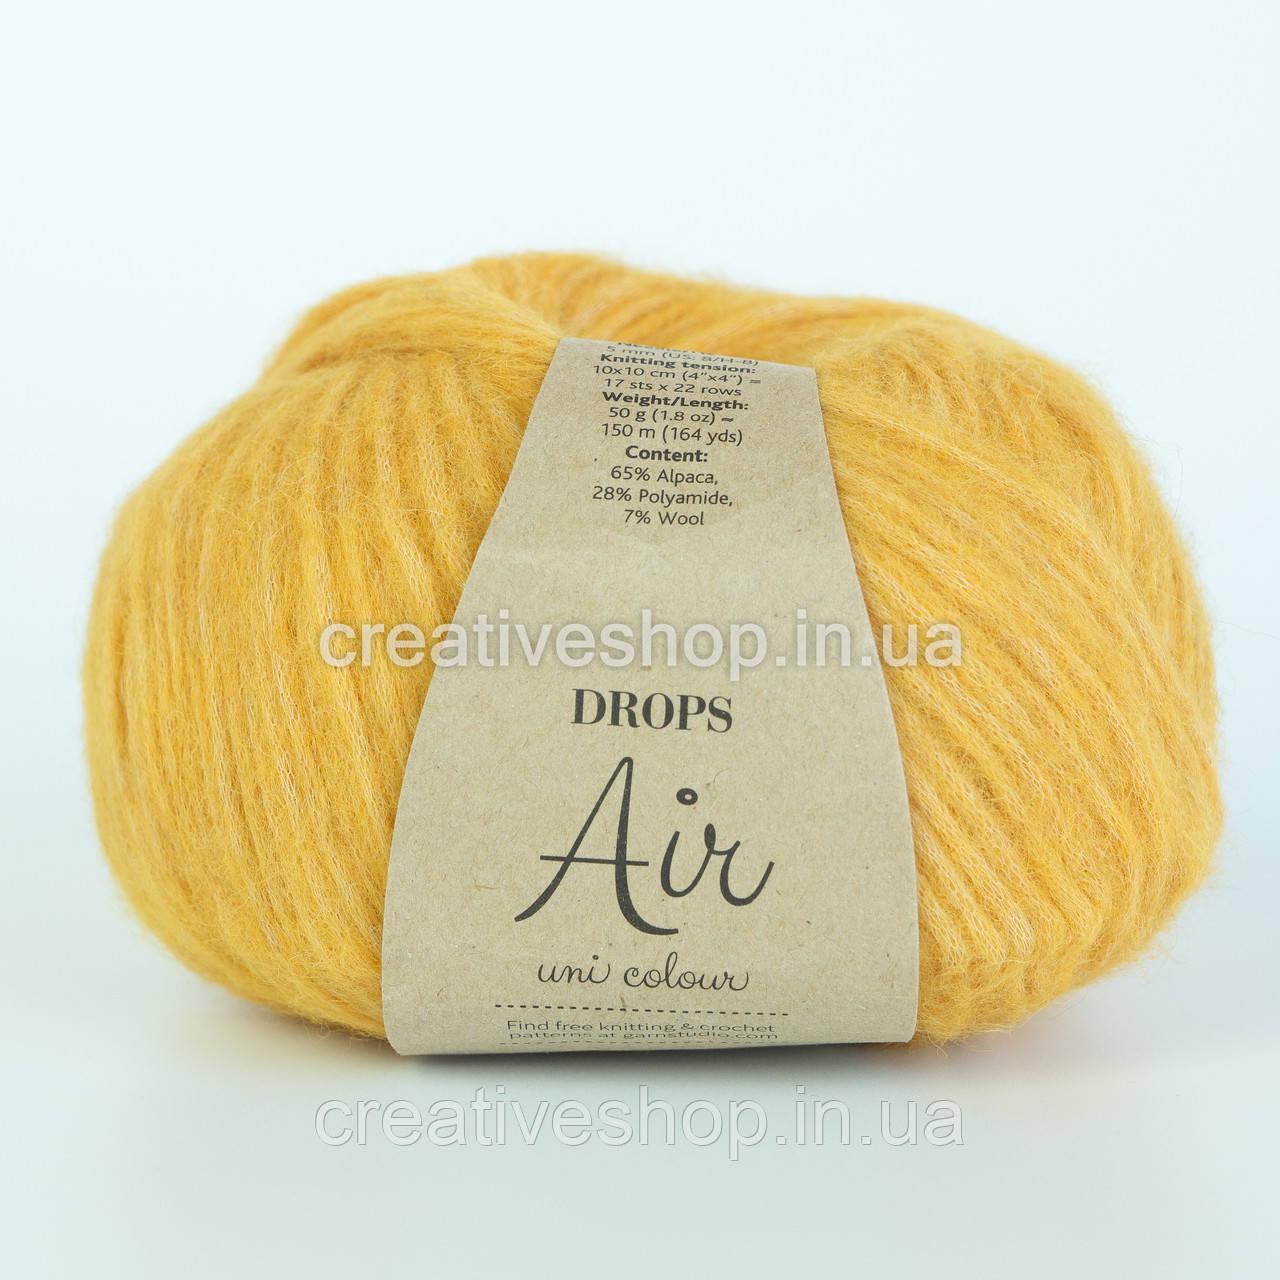 Пряжа Drops Air Uni (цвет 22 yellow)